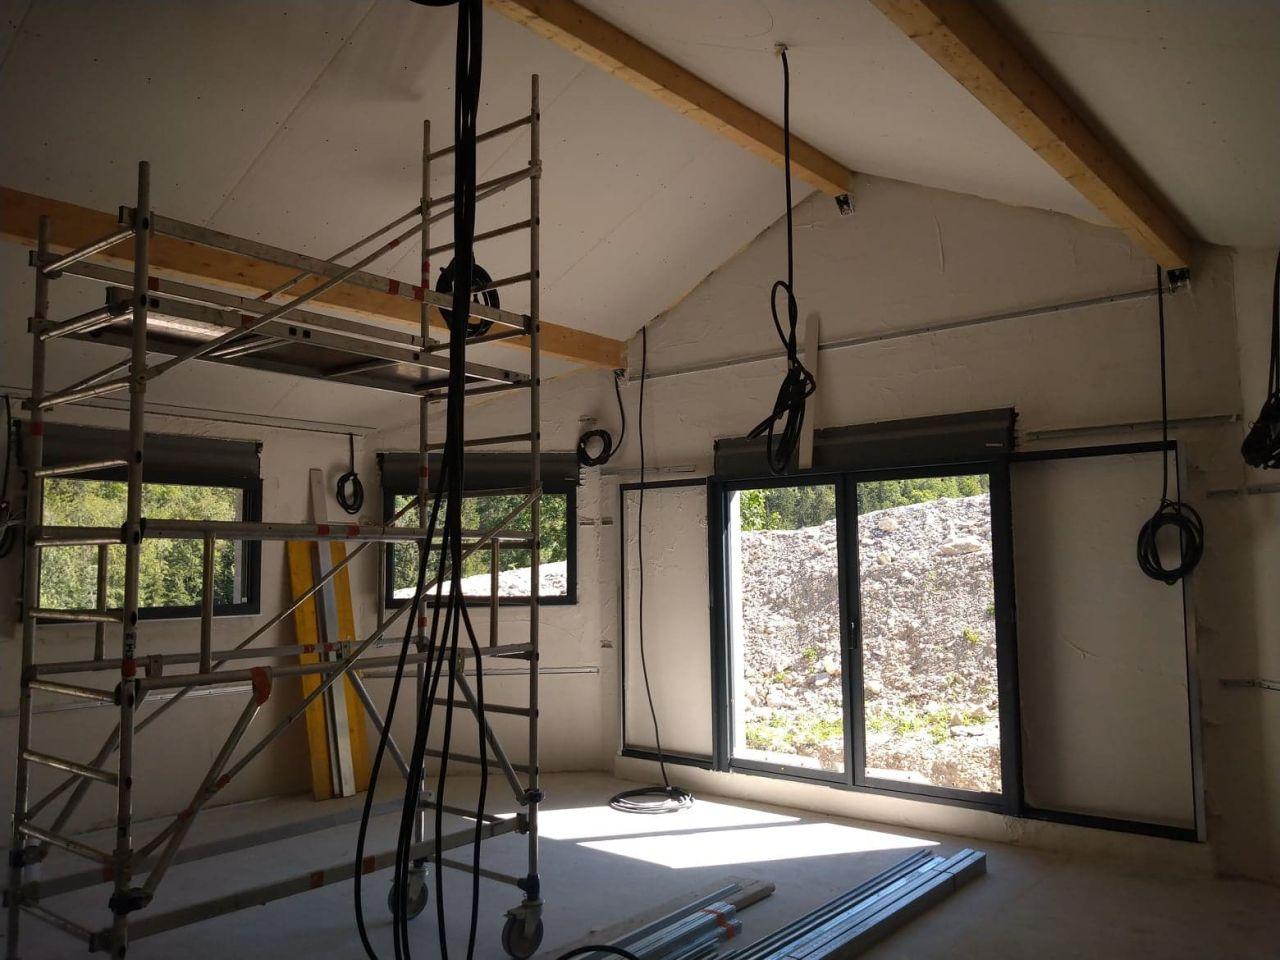 salle de vie, isolation du plafond fini